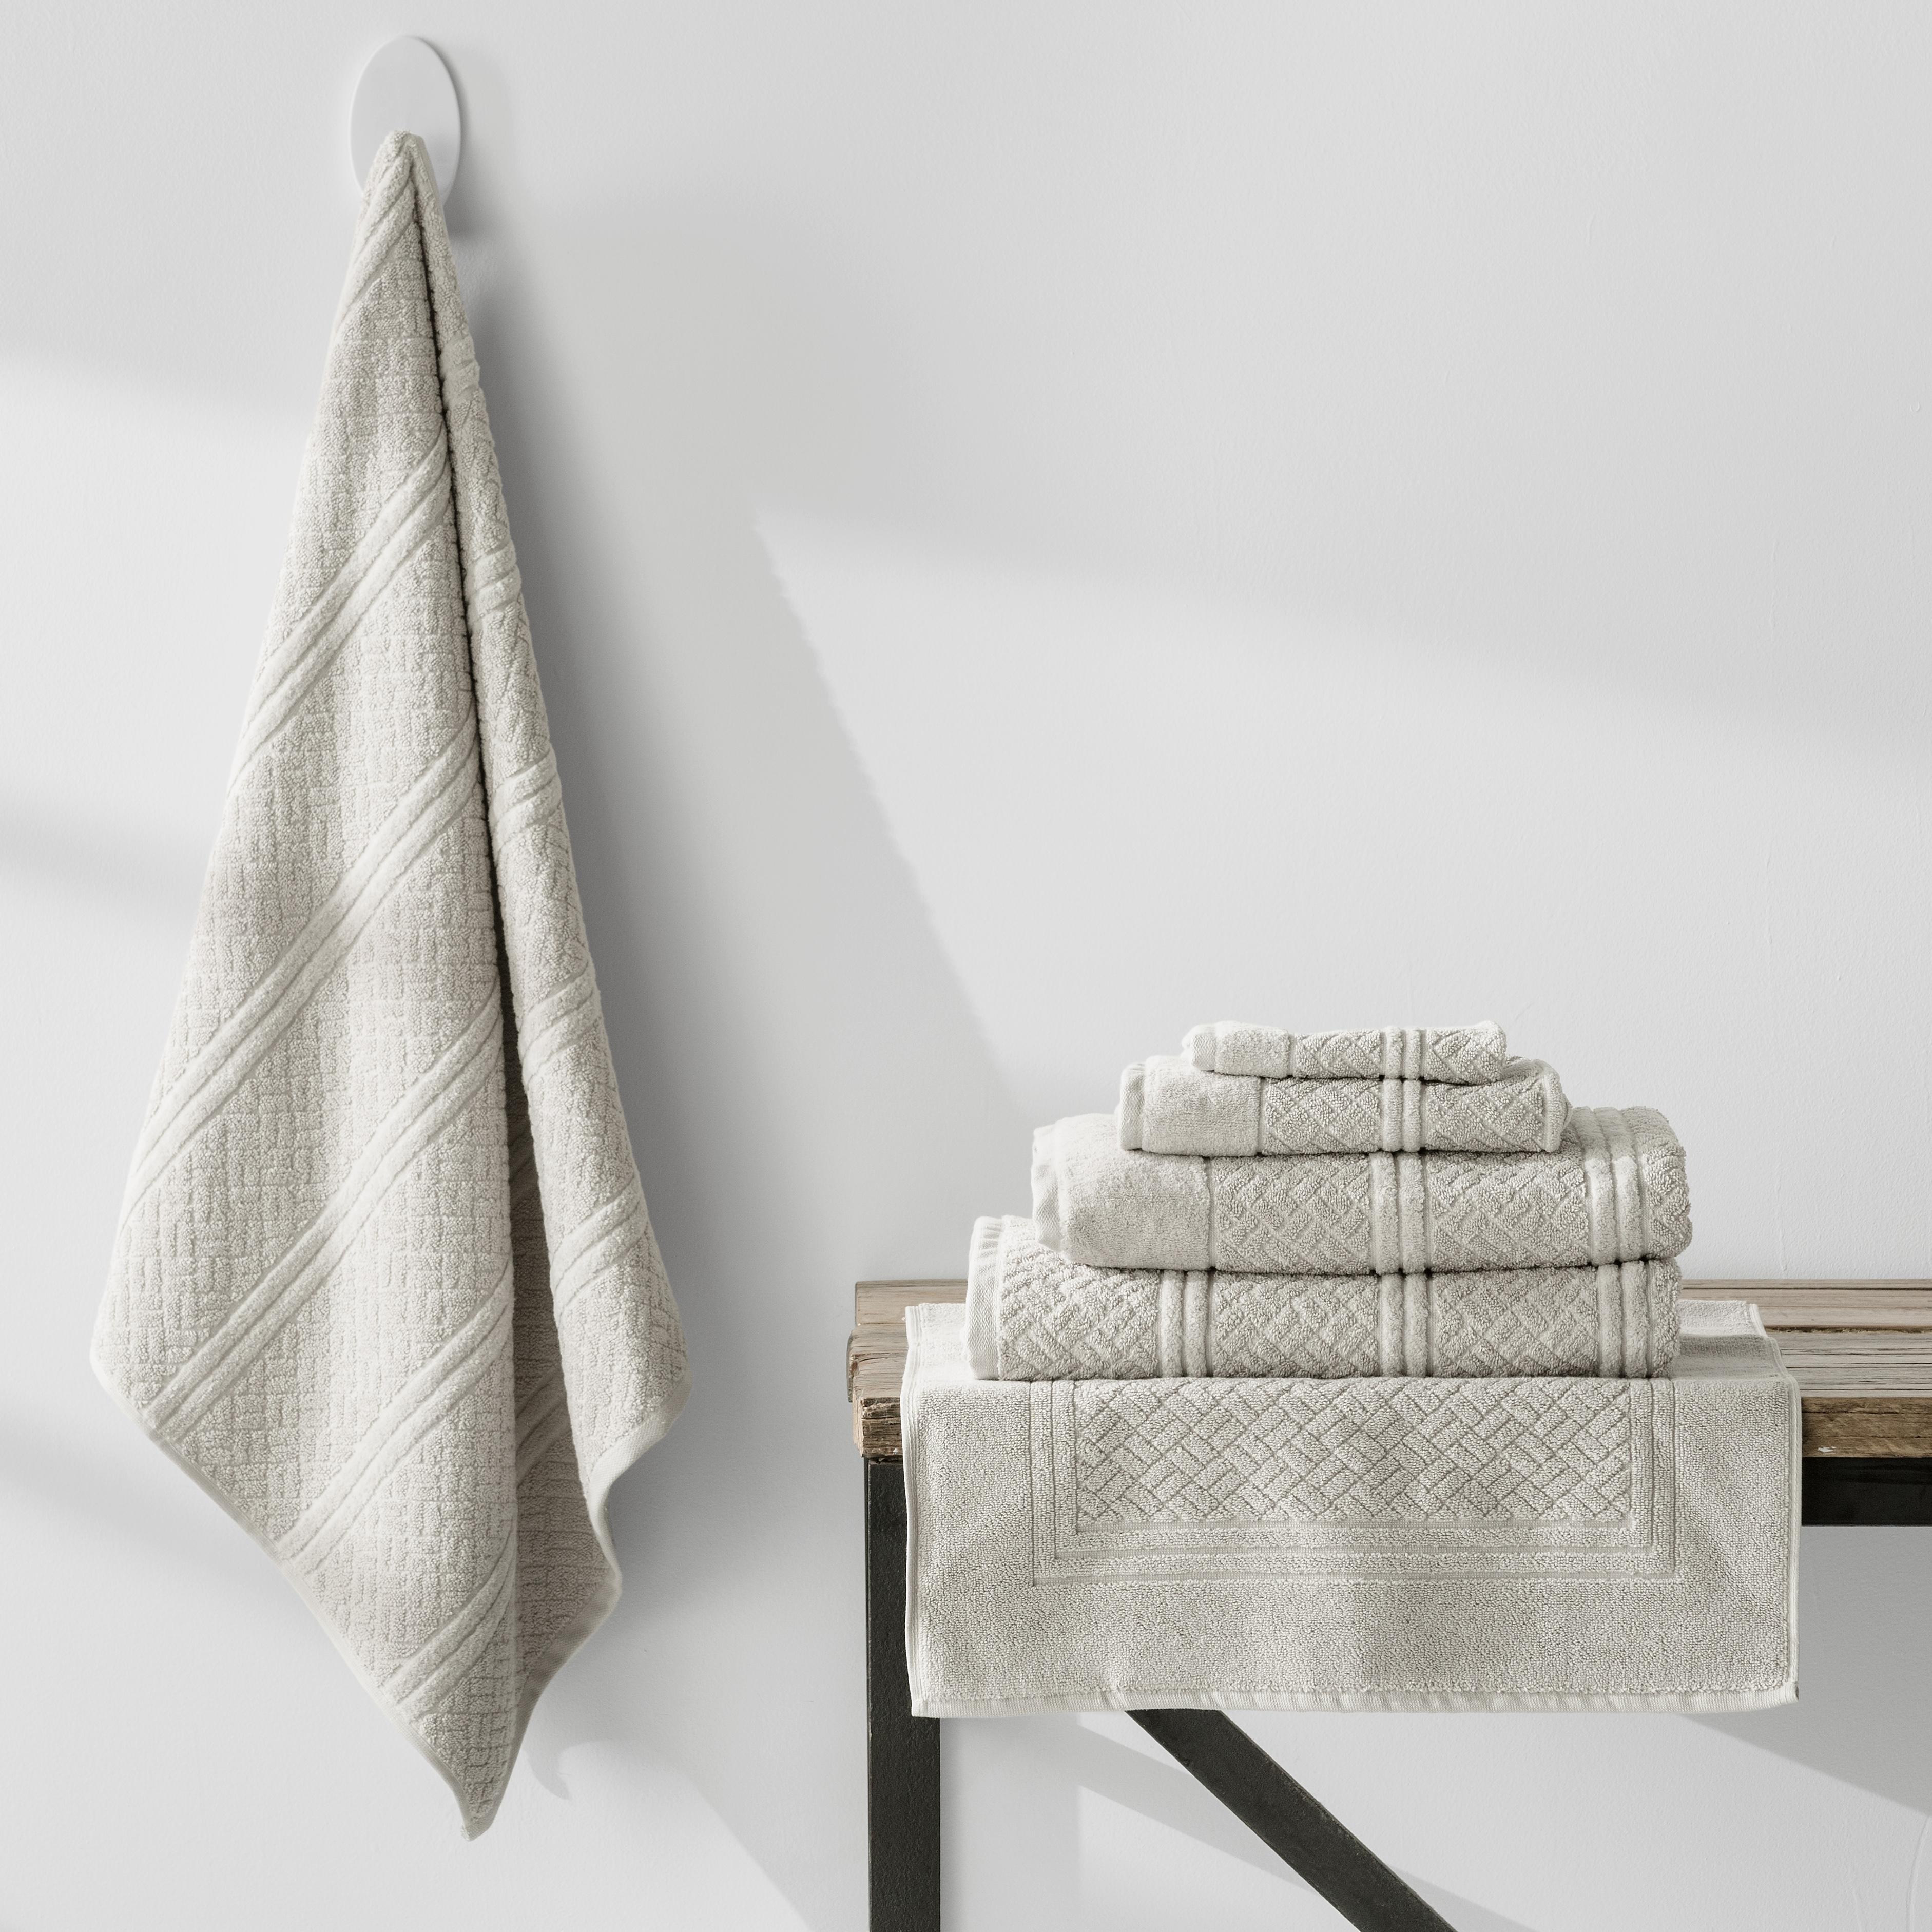 Turkish Cotton Towels Jaquard  Weave   Stone